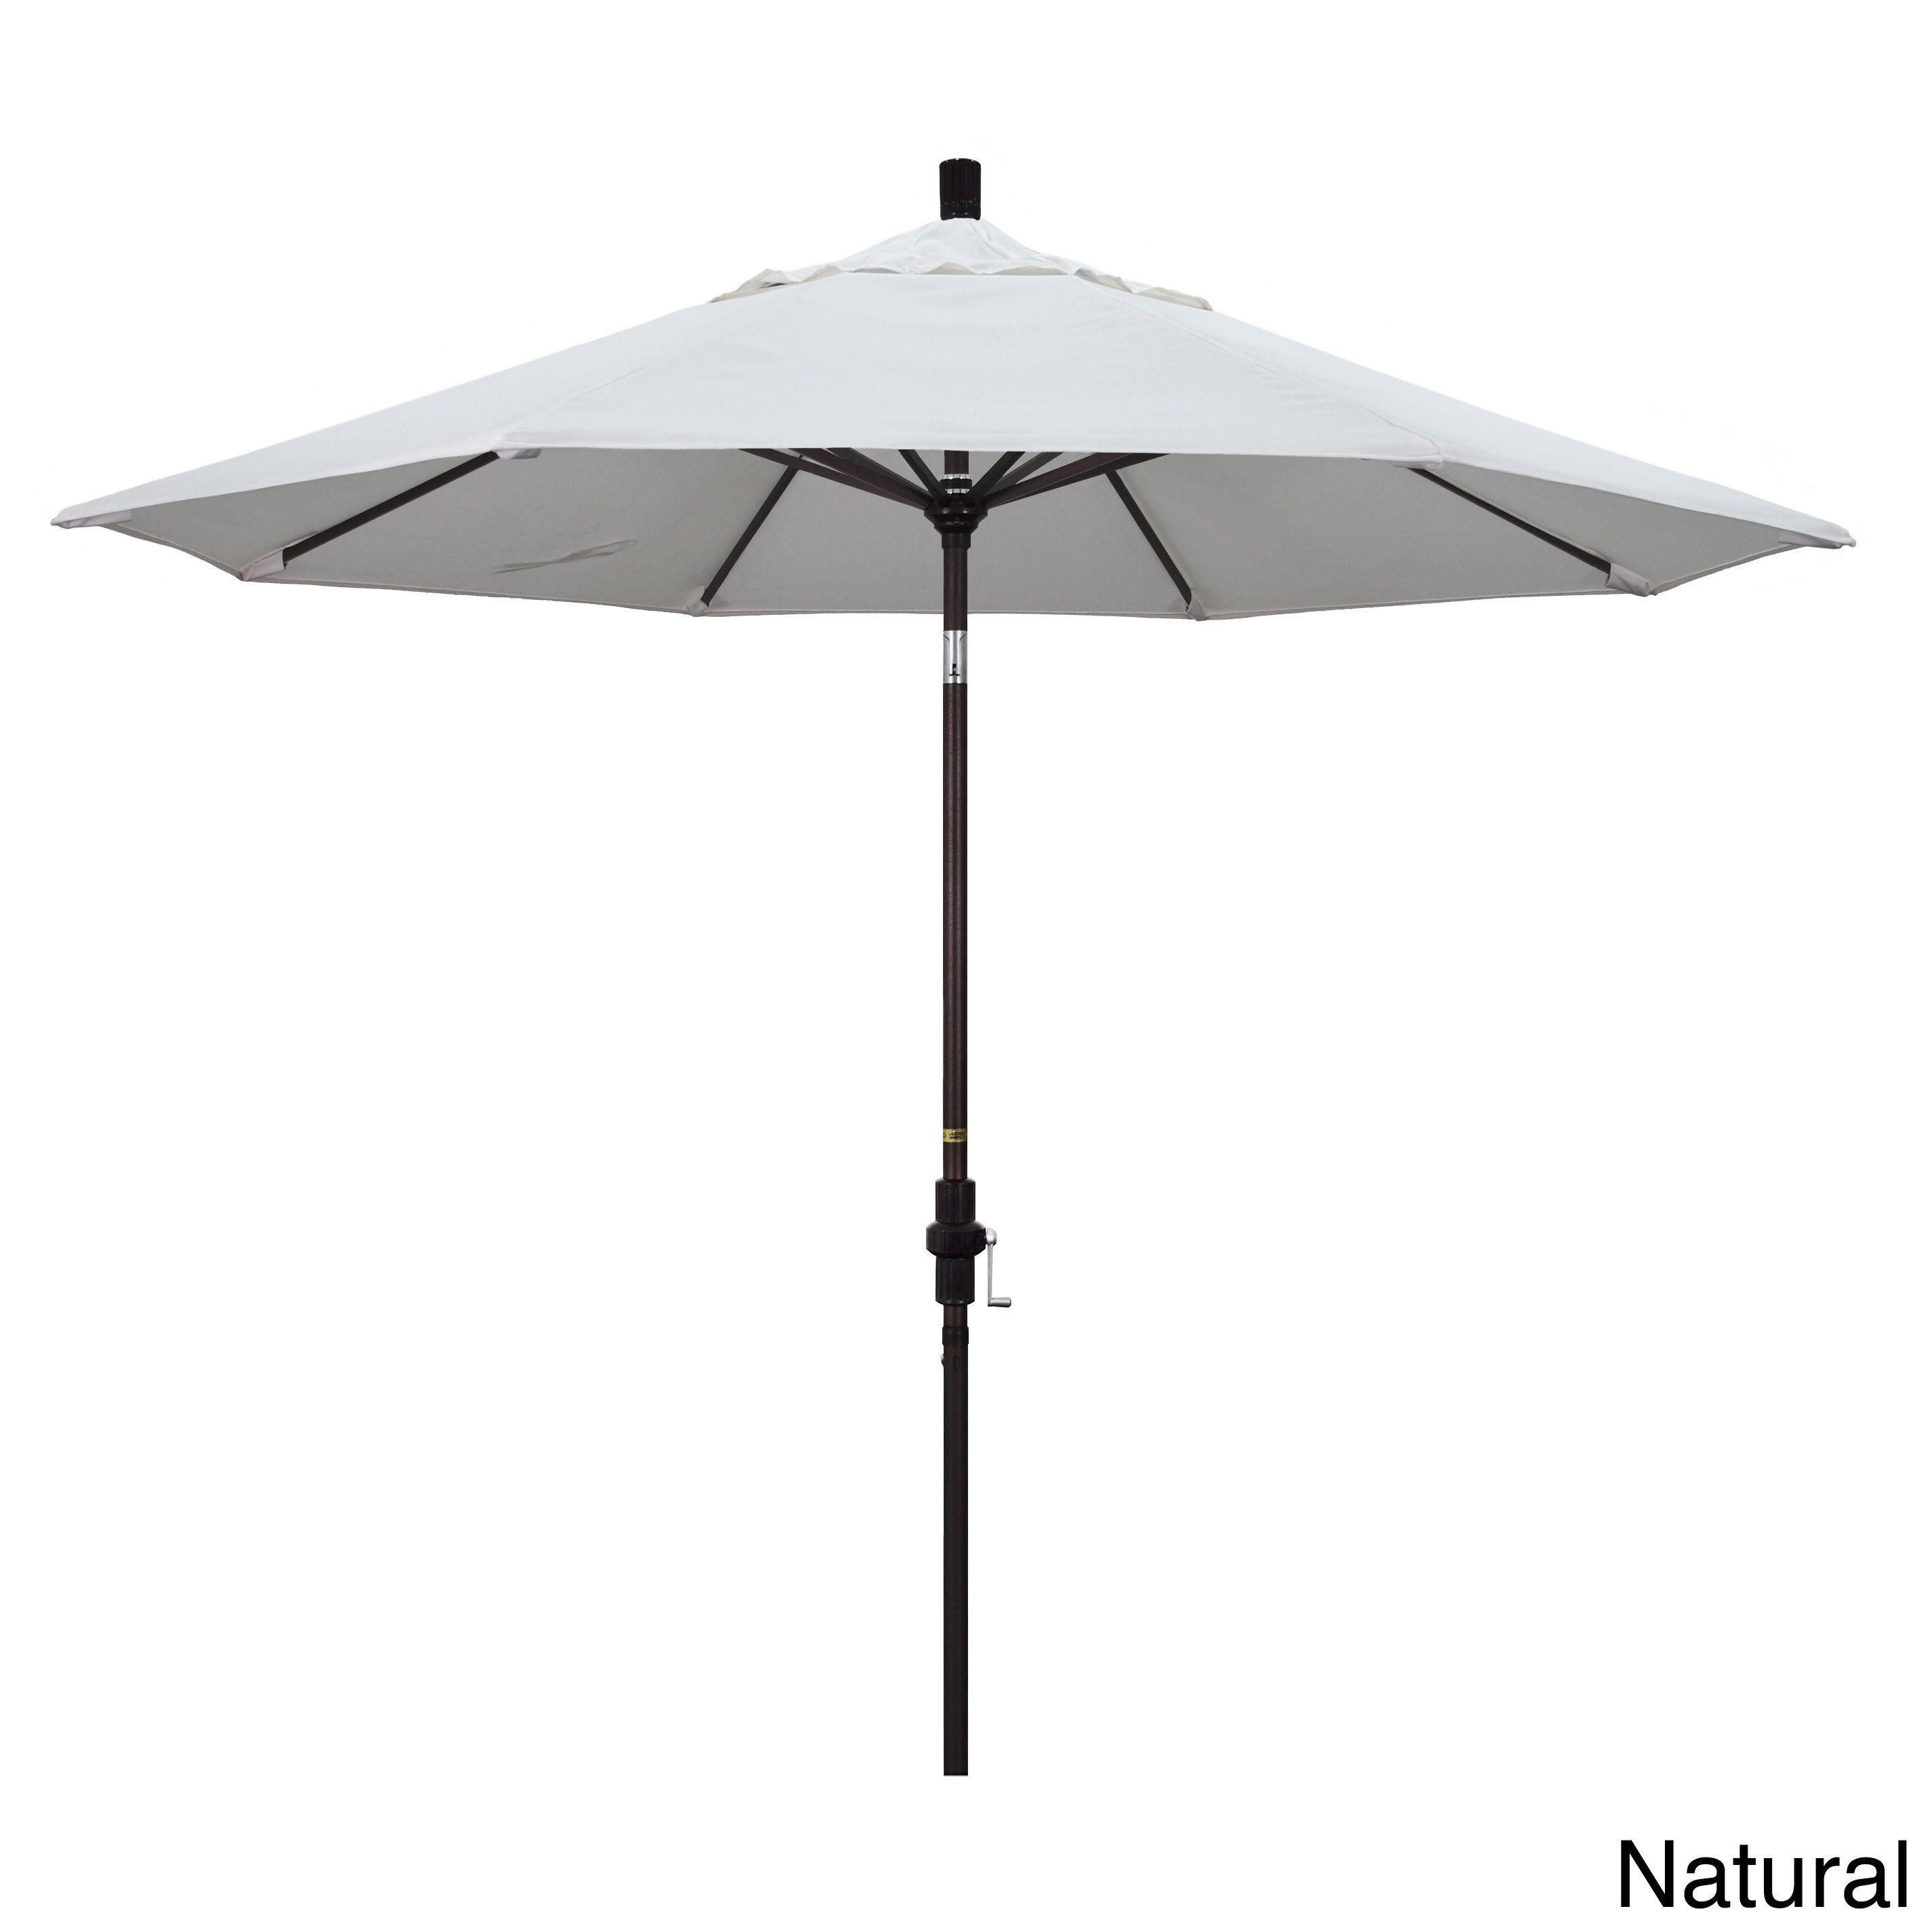 California Umbrella 9' Rd. Market Umbrella, Deluxe Crank Lift with Collar Tilt, Bronze Frame Finish, Pacifica Fabric, #GSCU908117-SA01